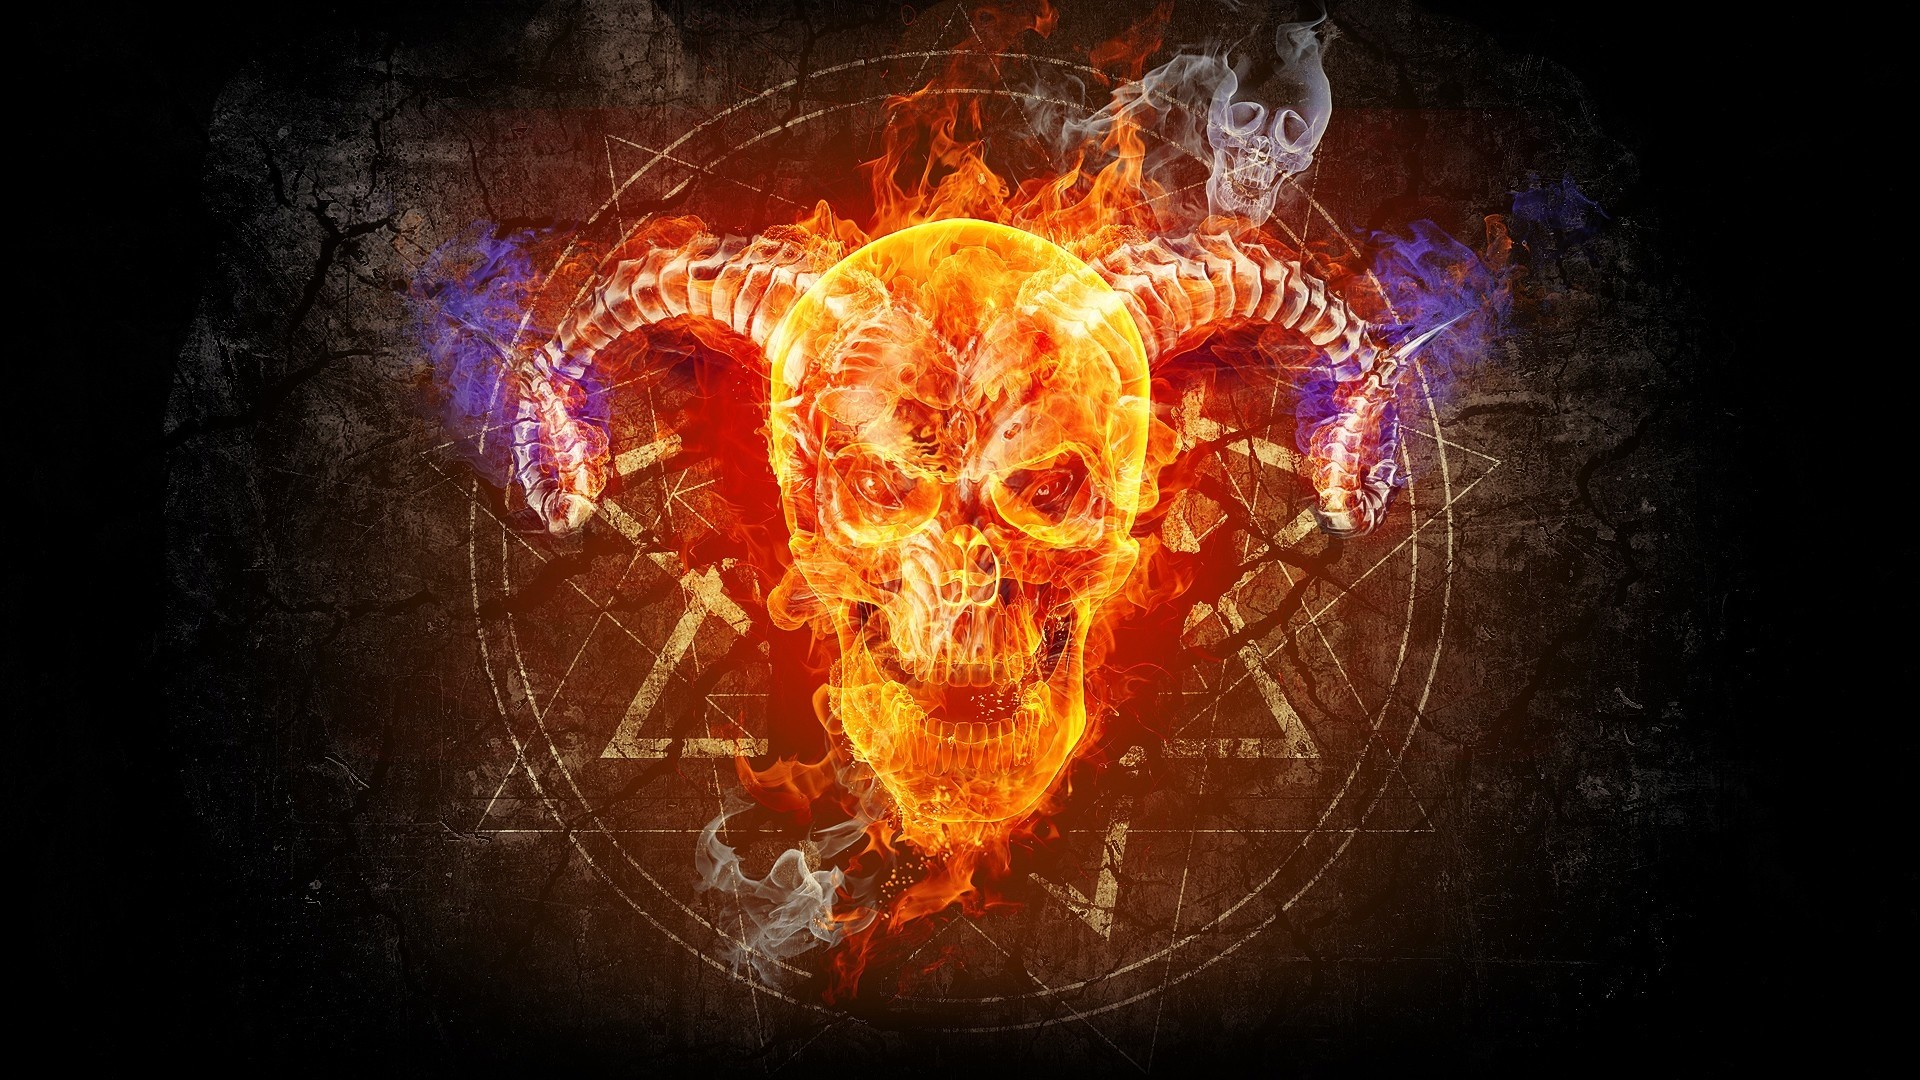 Red Flaming Skull Wallpaper 62 Images